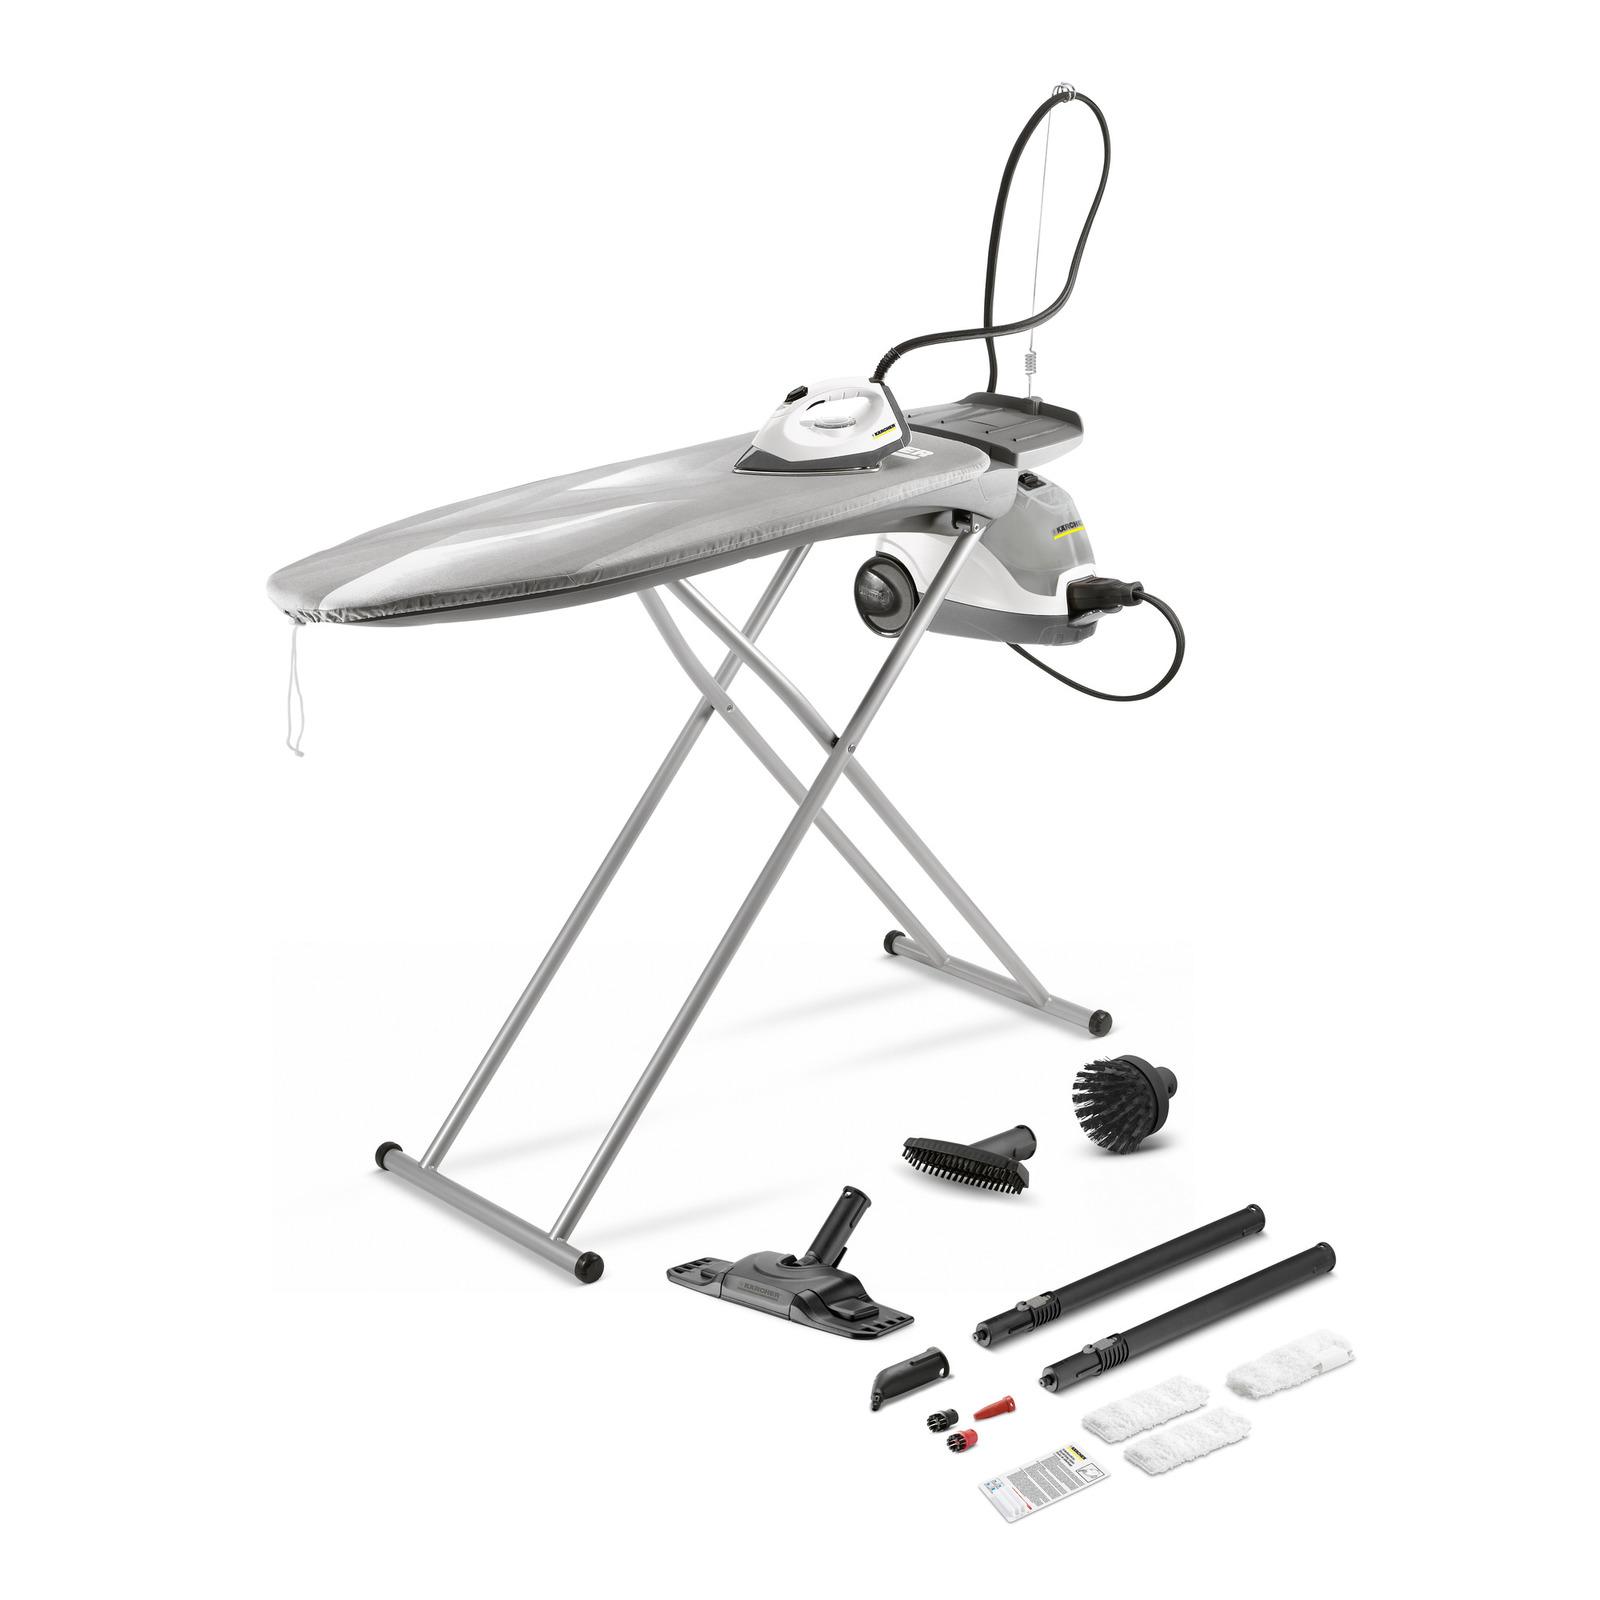 steam ironing station si 4 premium iron kit k rcher llc. Black Bedroom Furniture Sets. Home Design Ideas